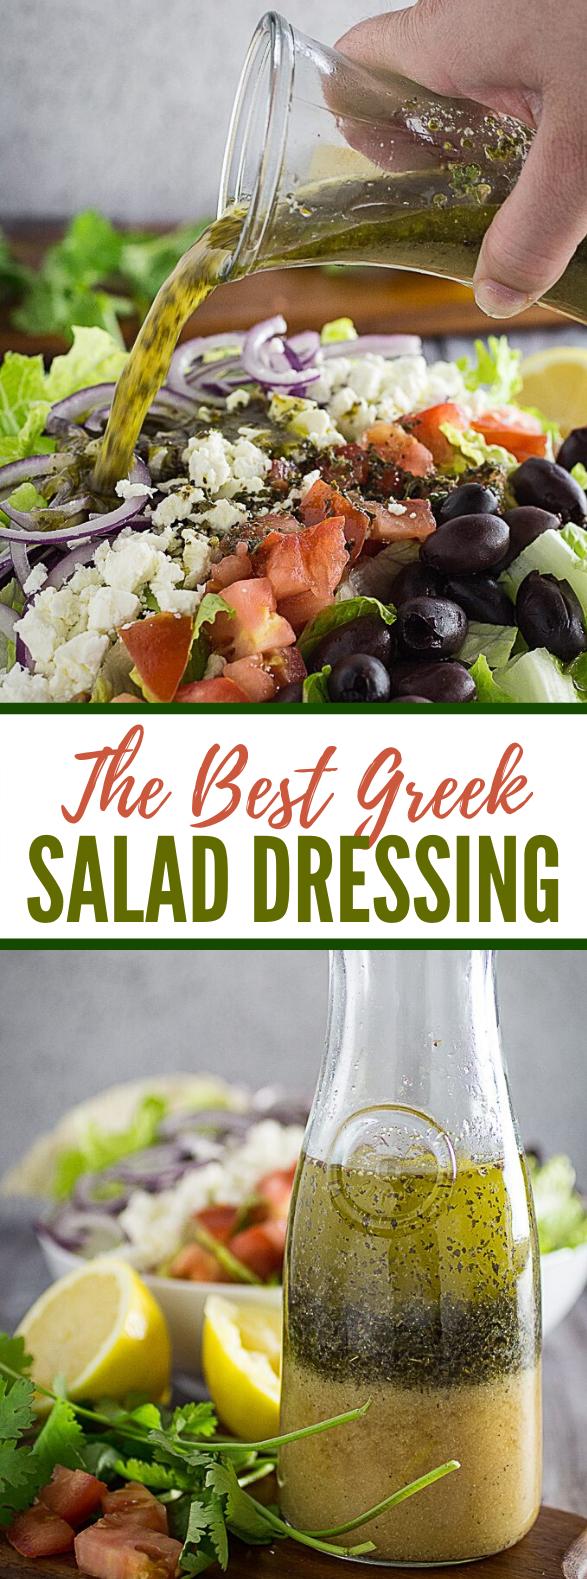 GREEK SALAD DRESSING & GREEK SALAD #vegetarian #veggies